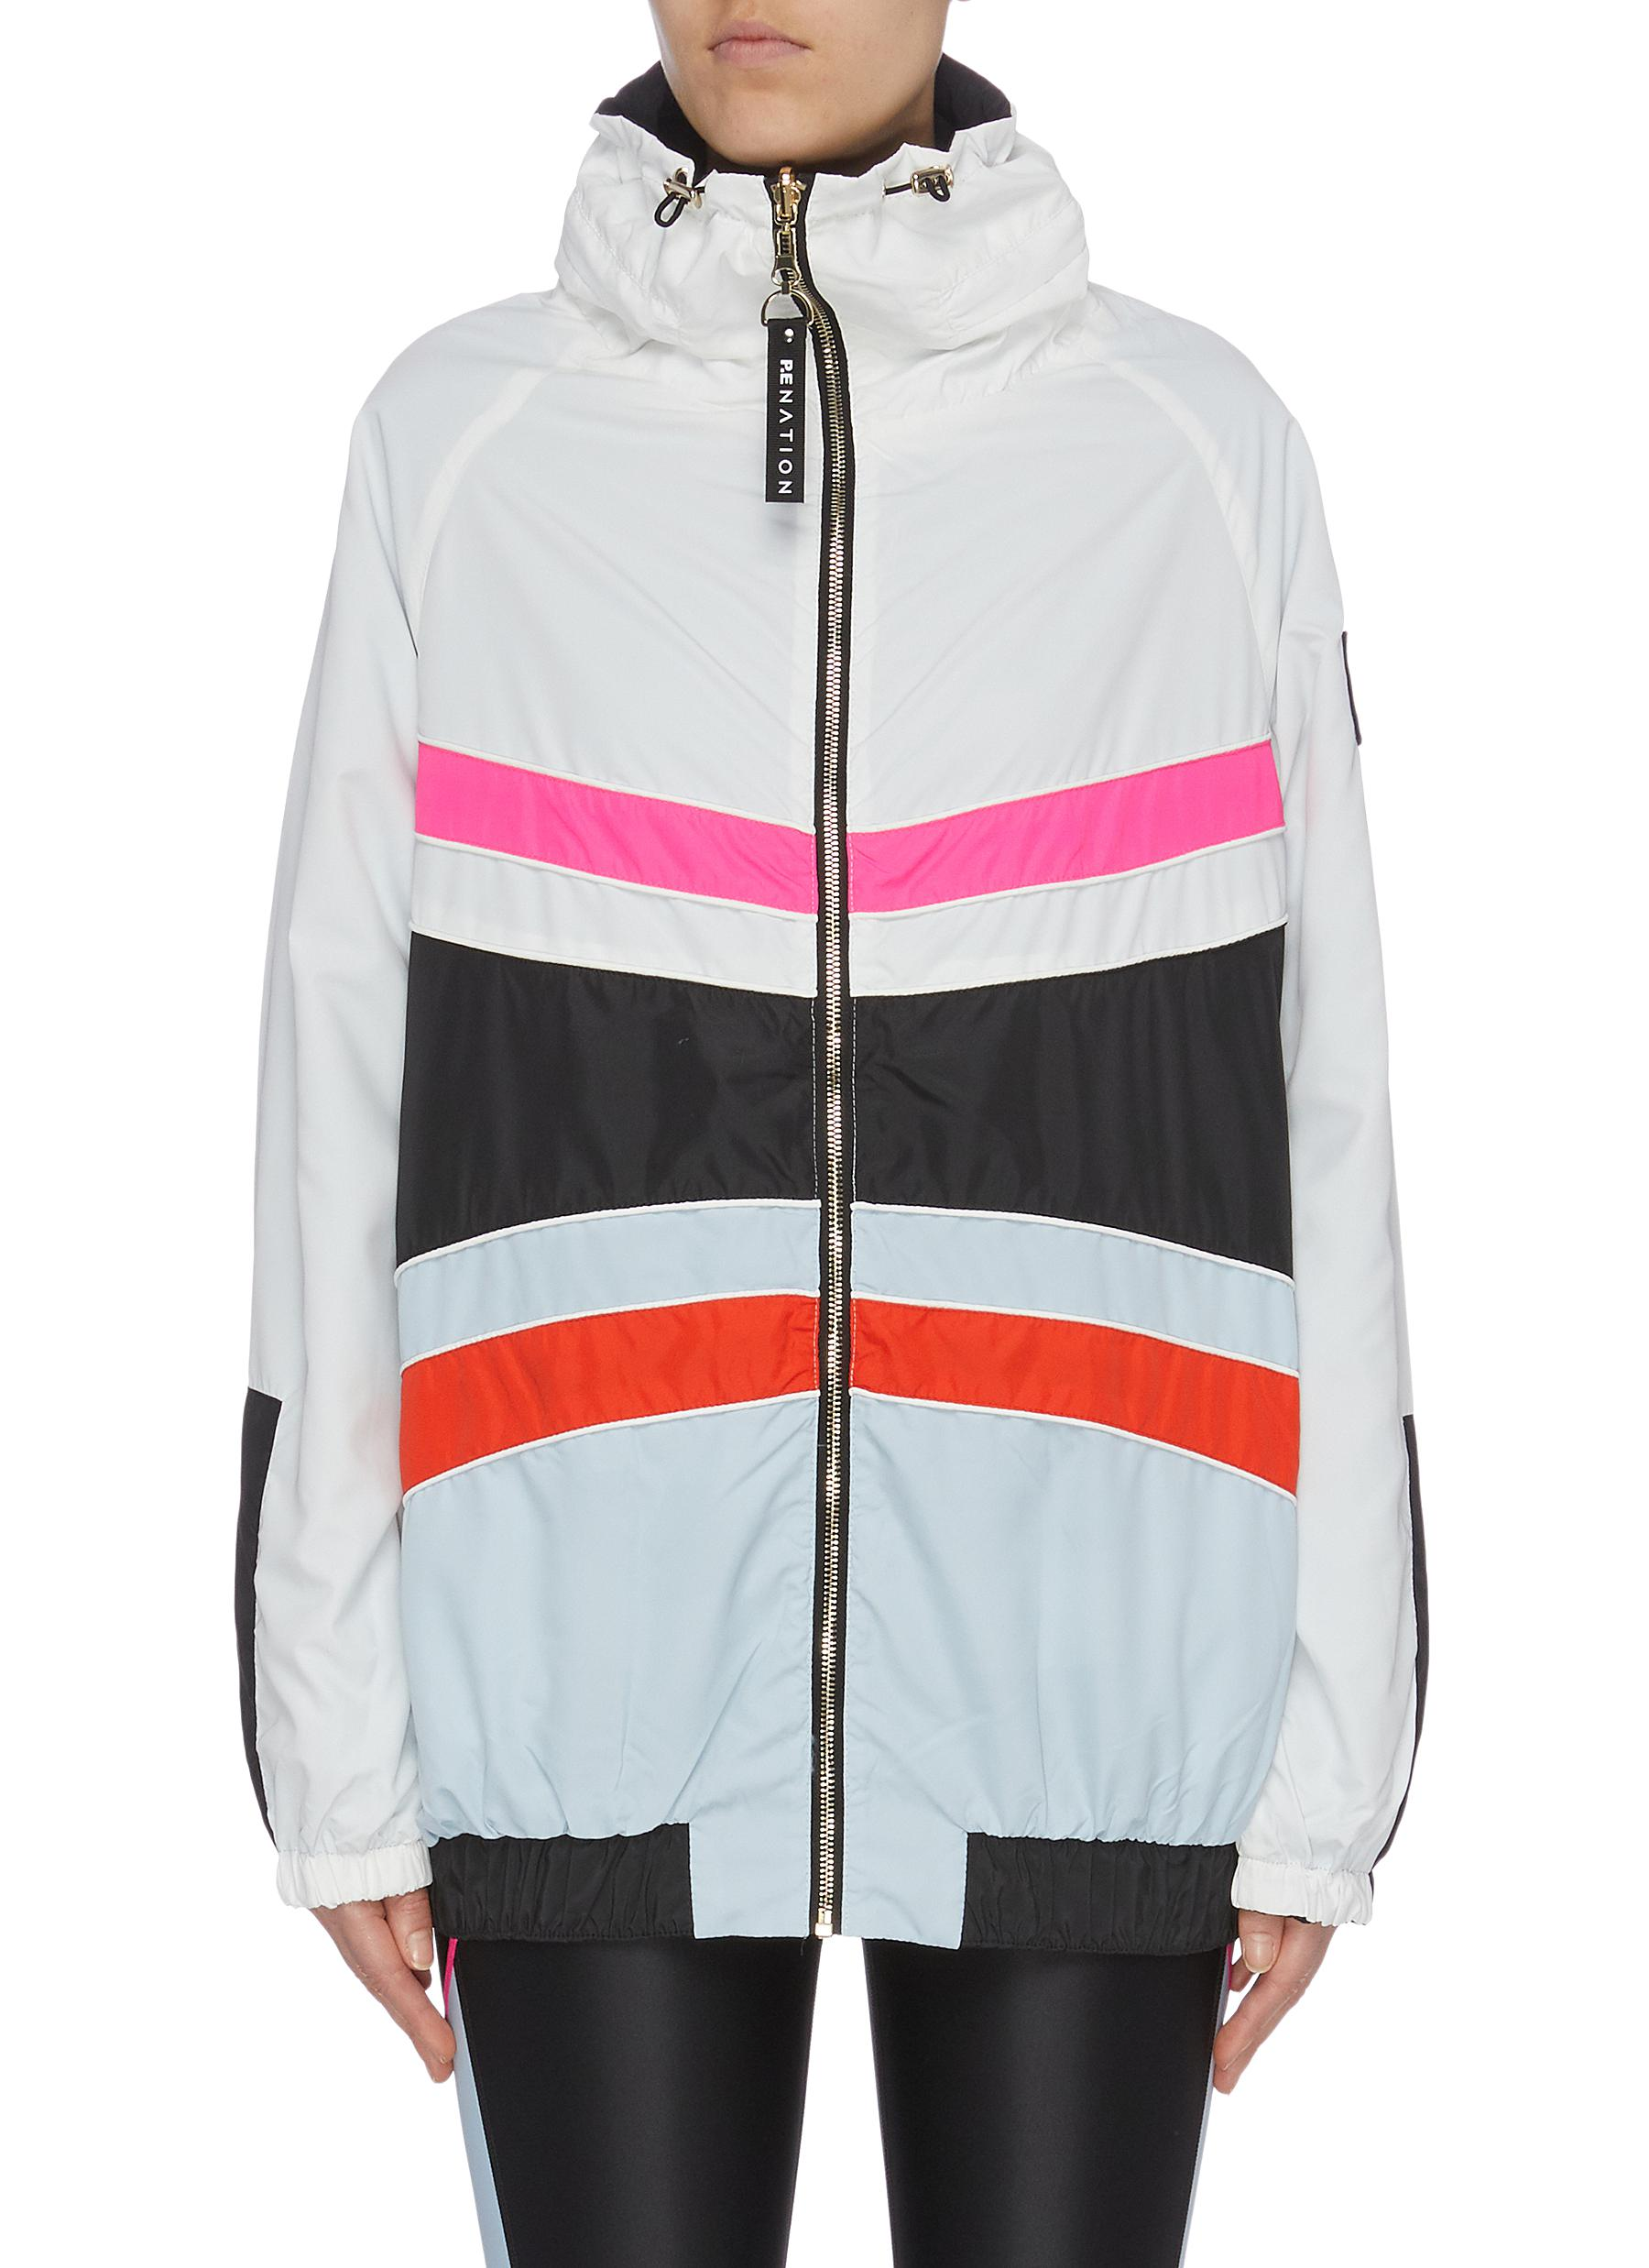 Easy Run stripe colourblock reversible jacket by P.E Nation